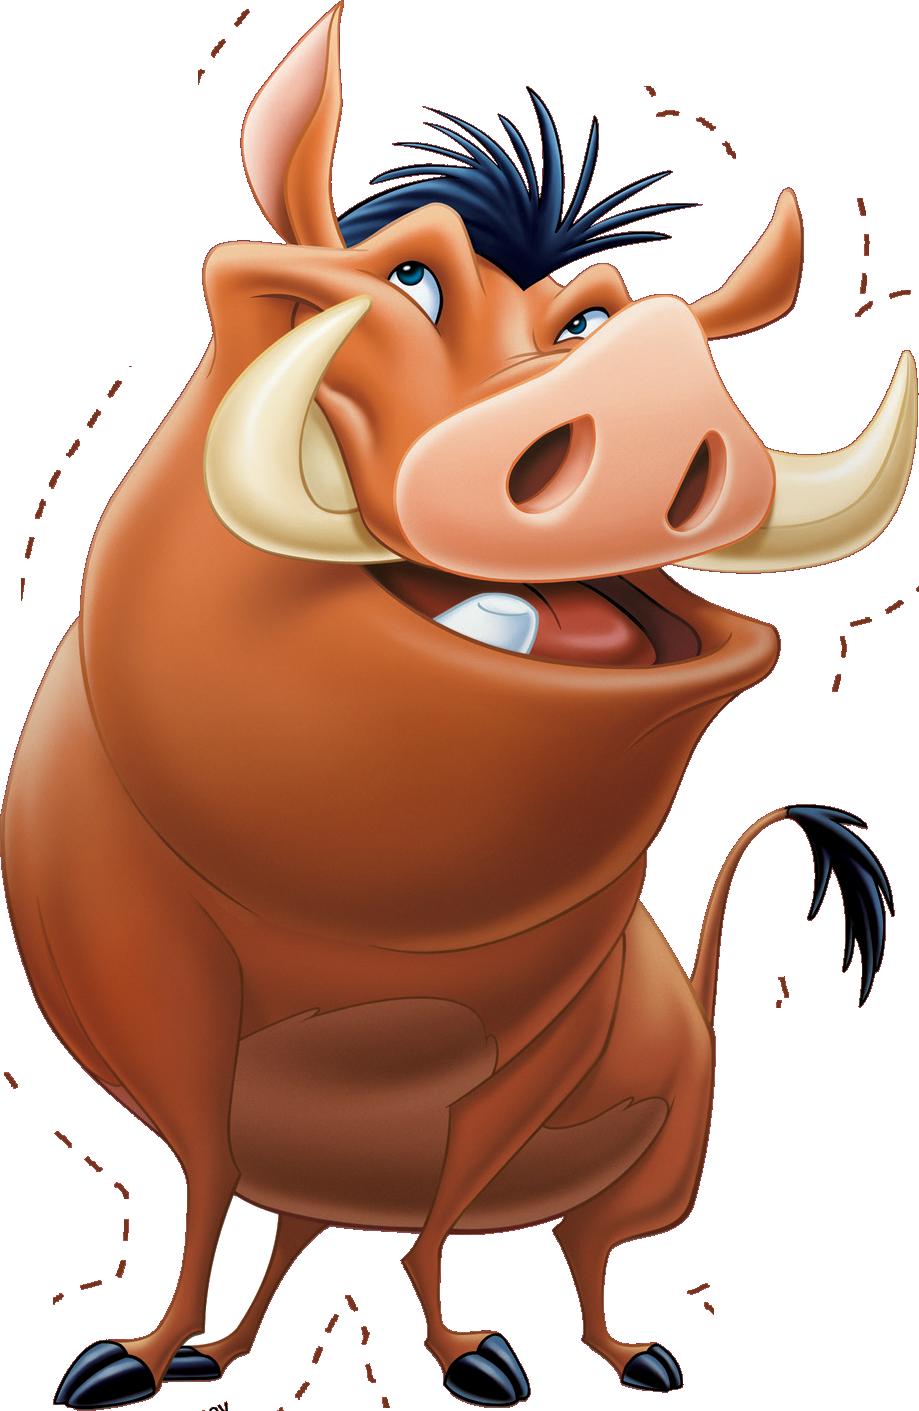 Пумба (Король Лев) - пумба, мультфильмы, король лев, кабан